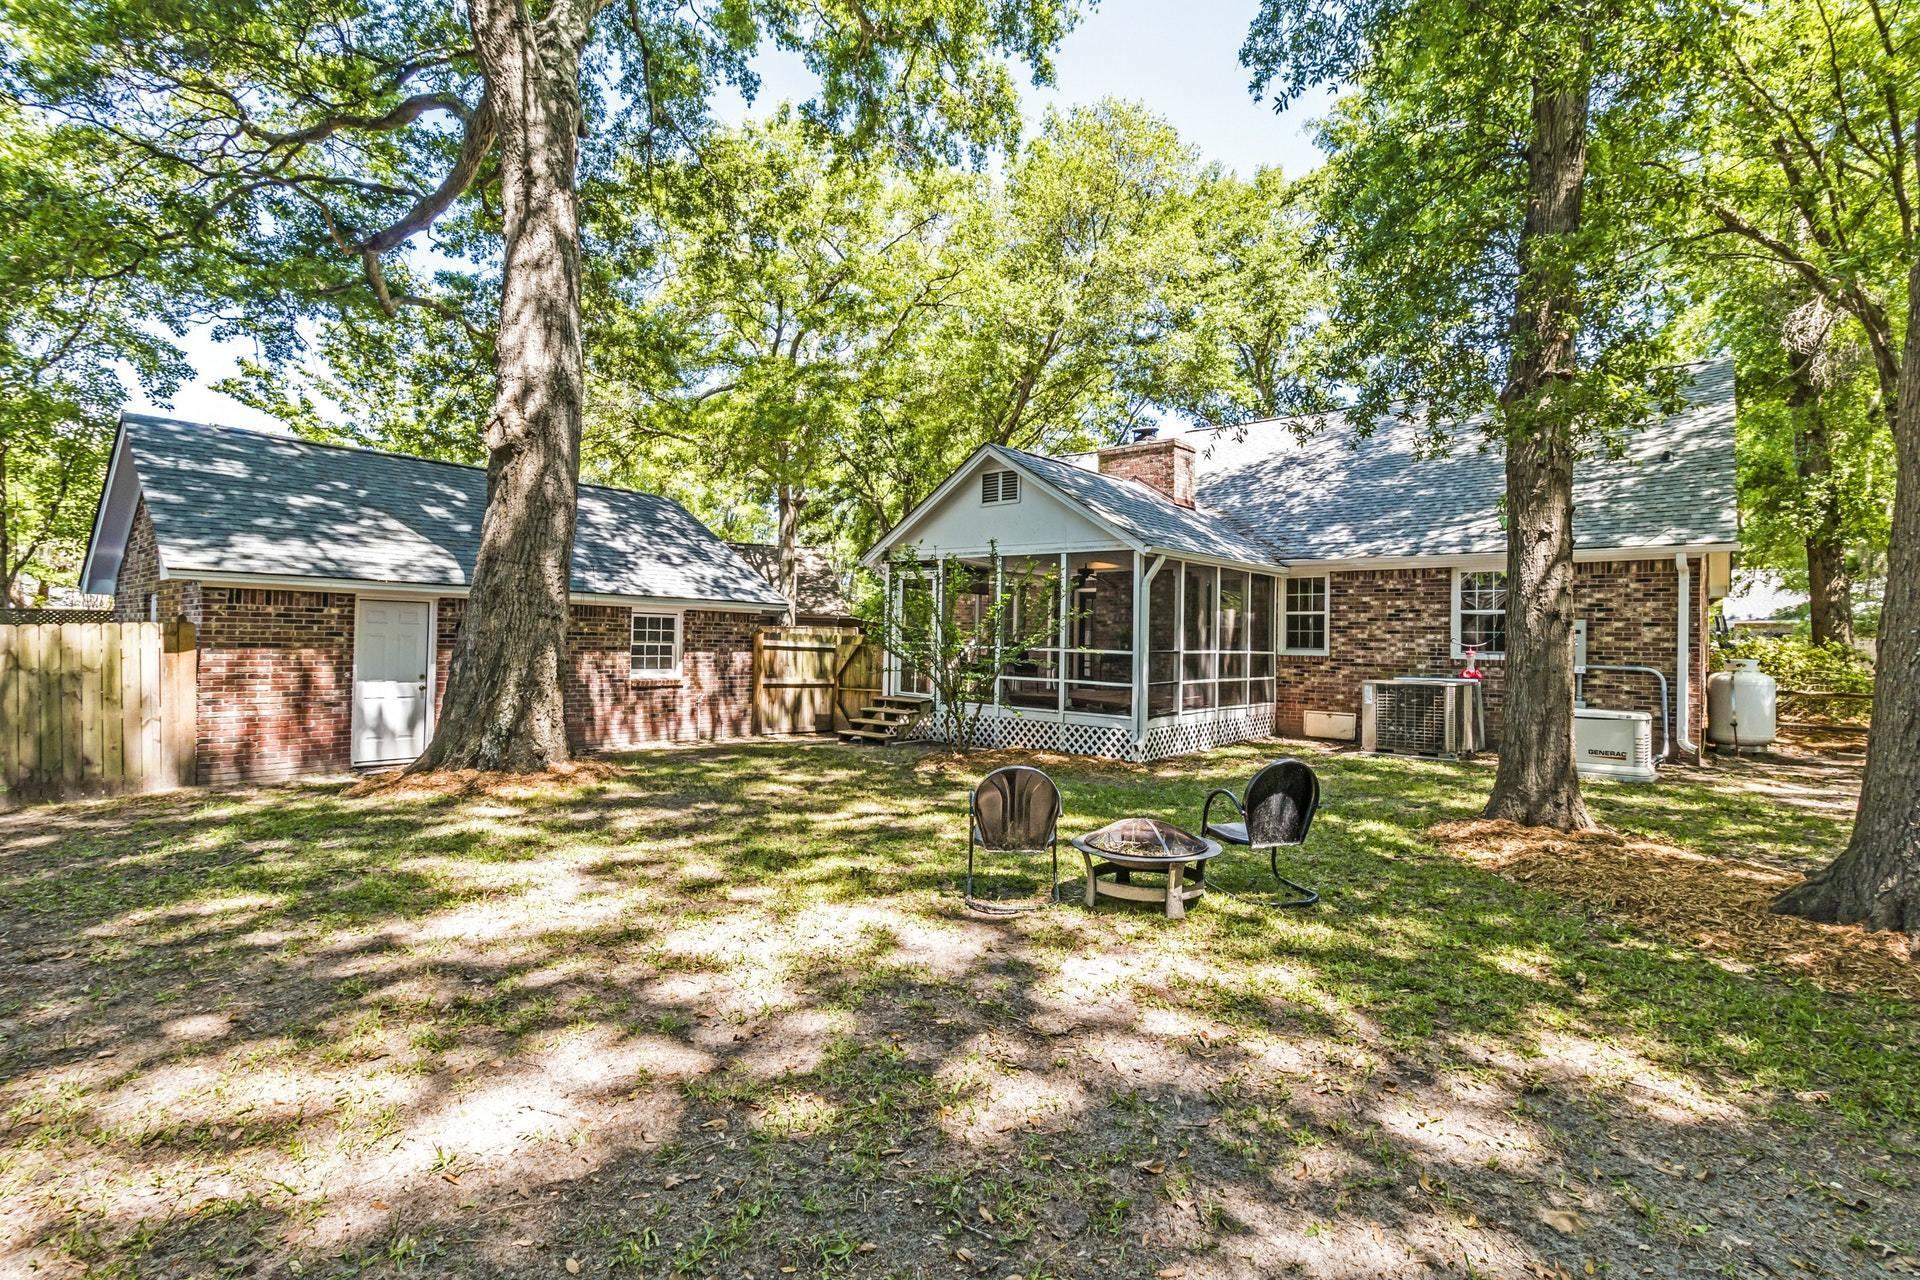 Shemwood II Homes For Sale - 969 Sea Gull, Mount Pleasant, SC - 0